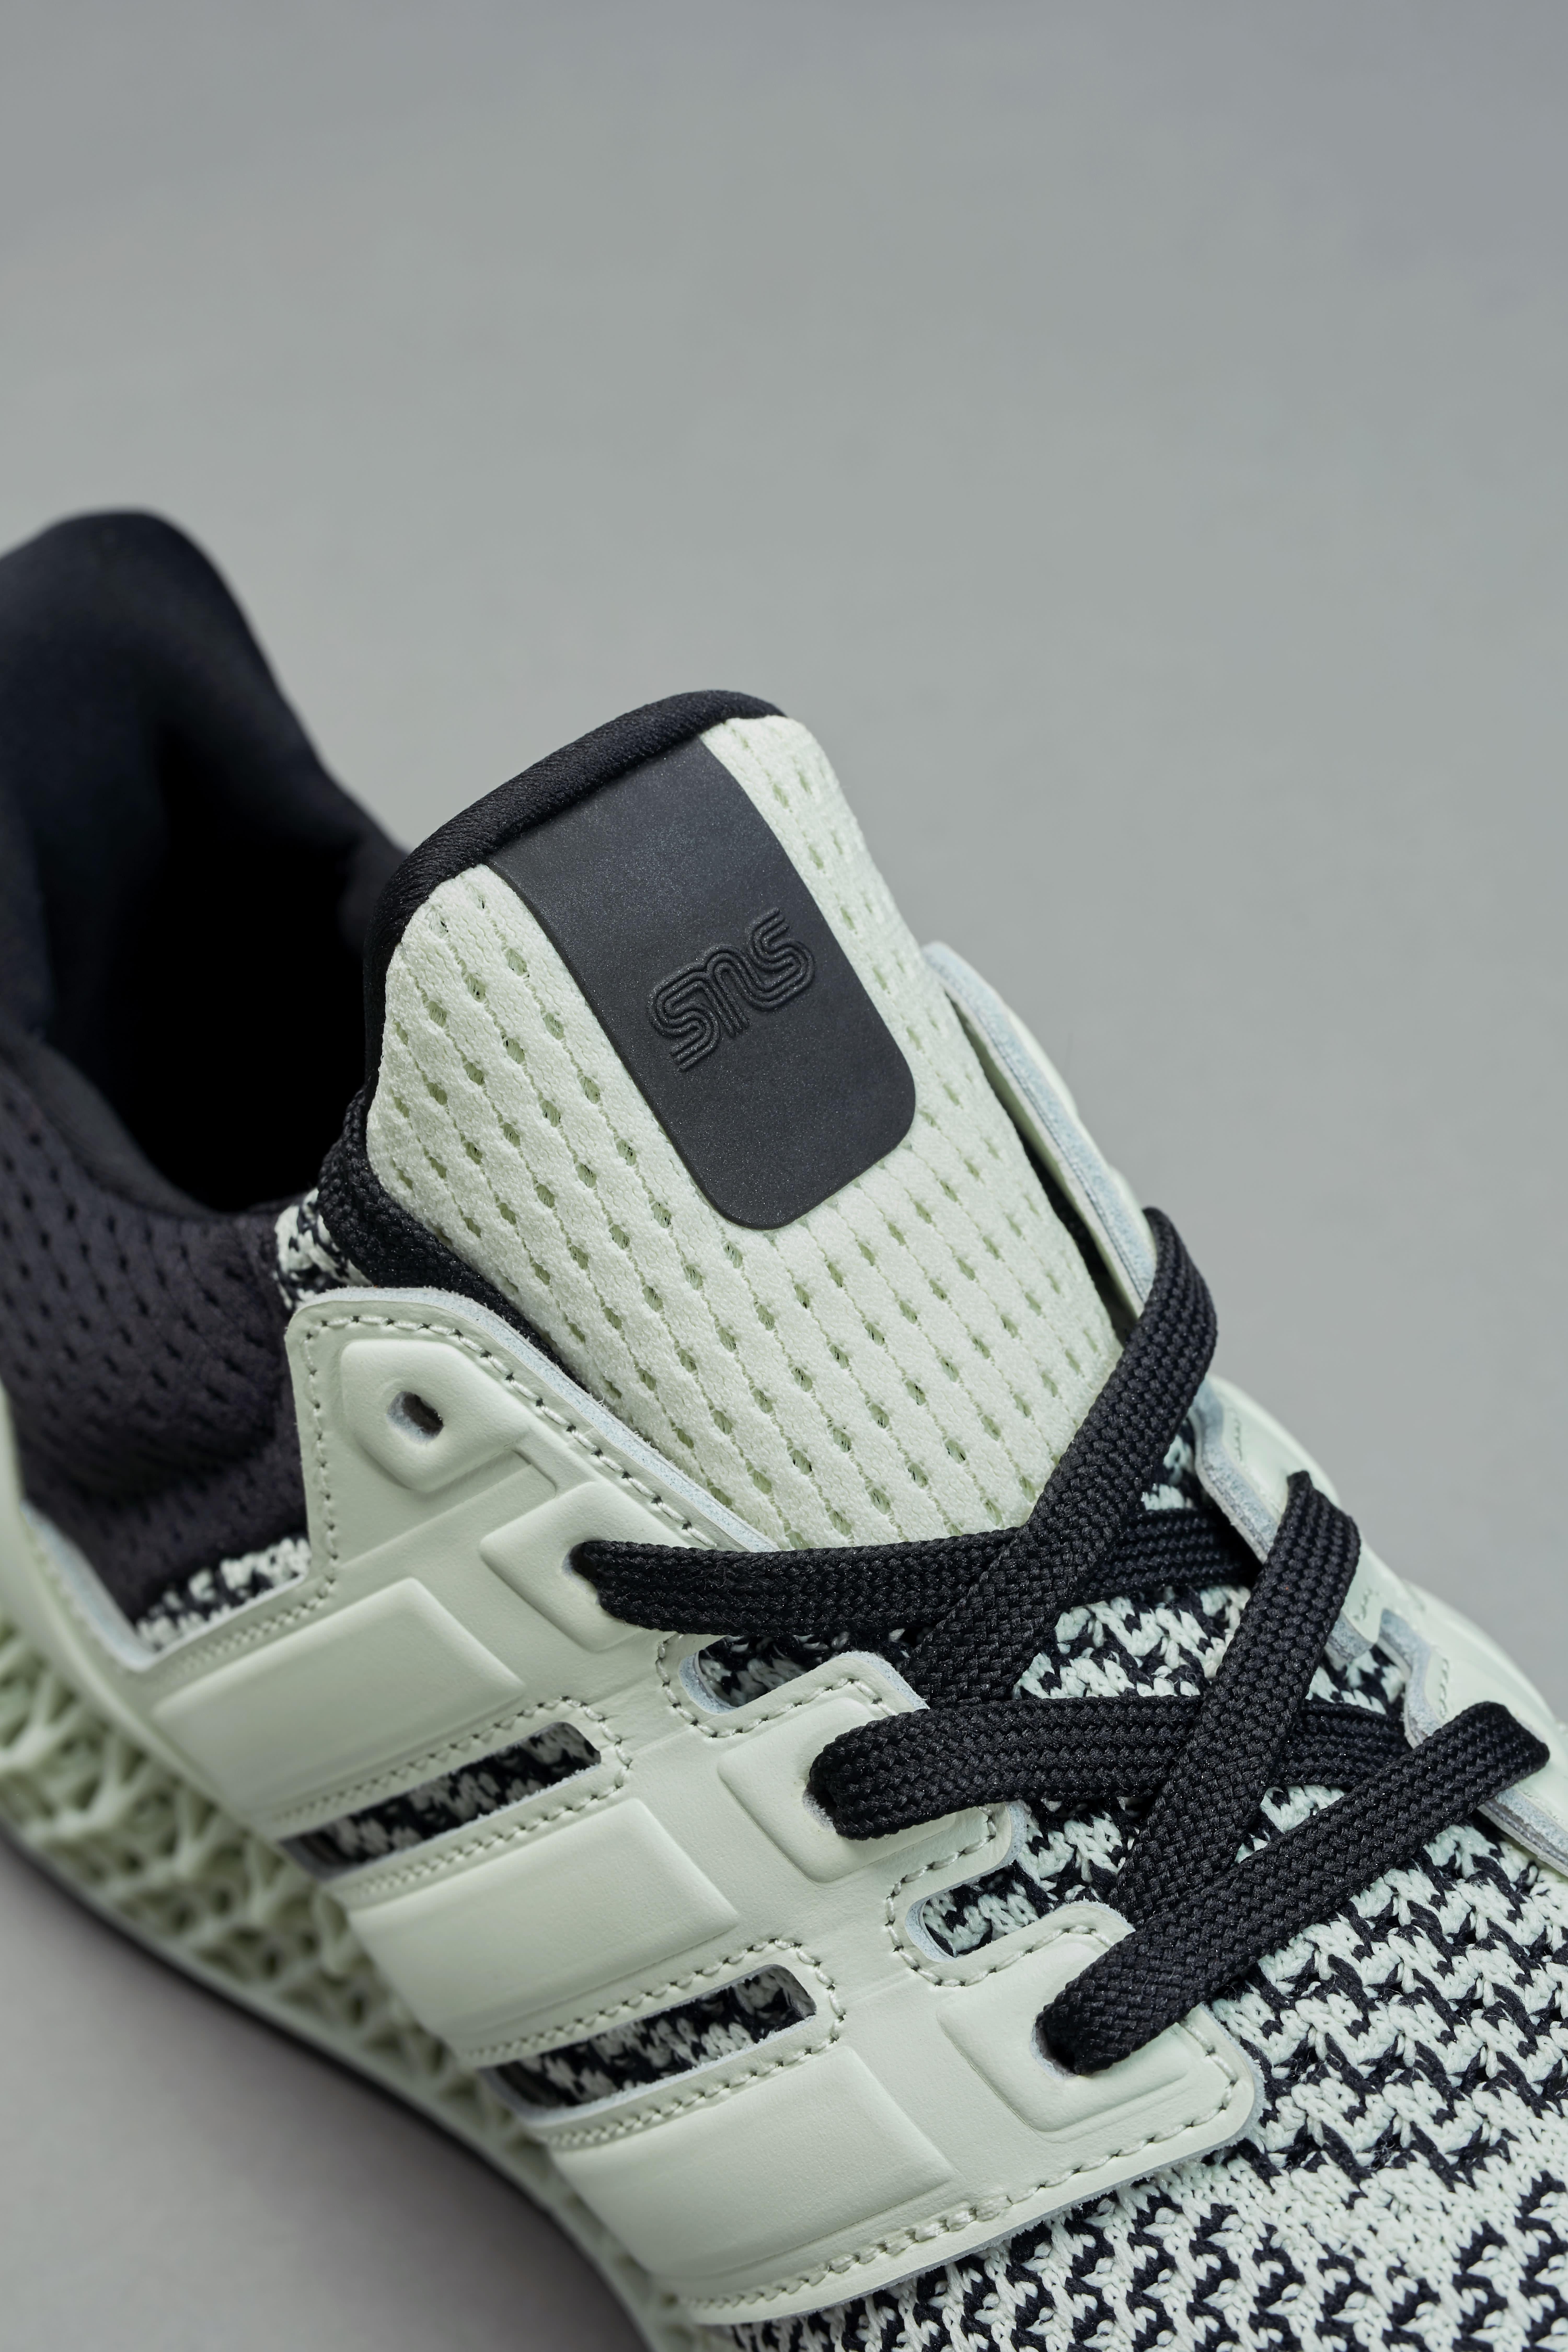 Sneakersnstuff x Adidas Ultra 4D 'Green Teatime' Tongue